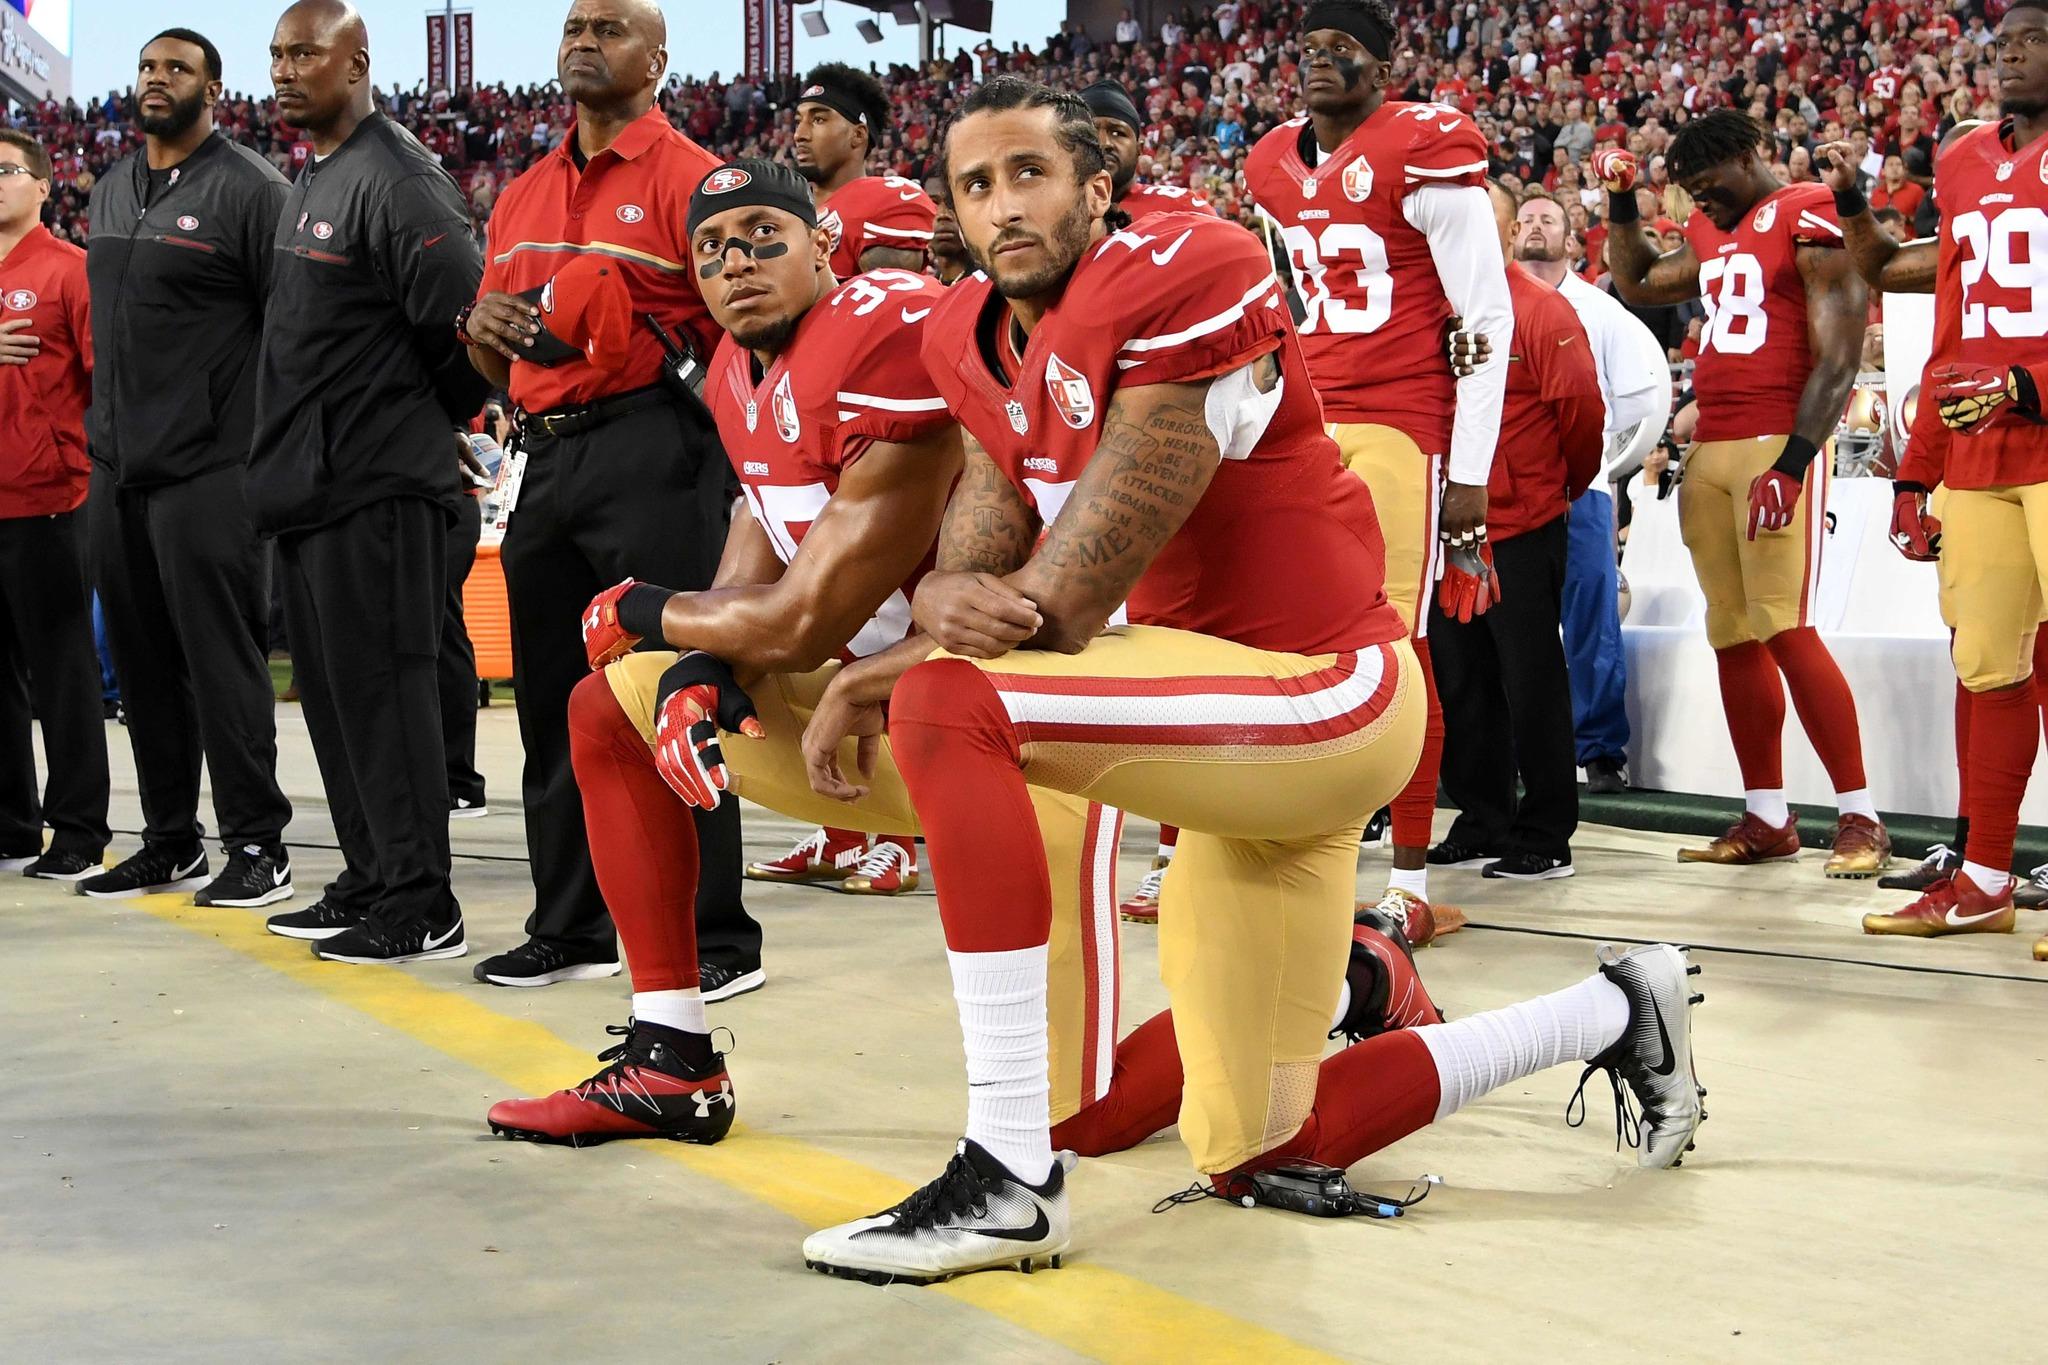 Colin Kaepernick (San Francisco 49ers) protestando rodilla en tierra...